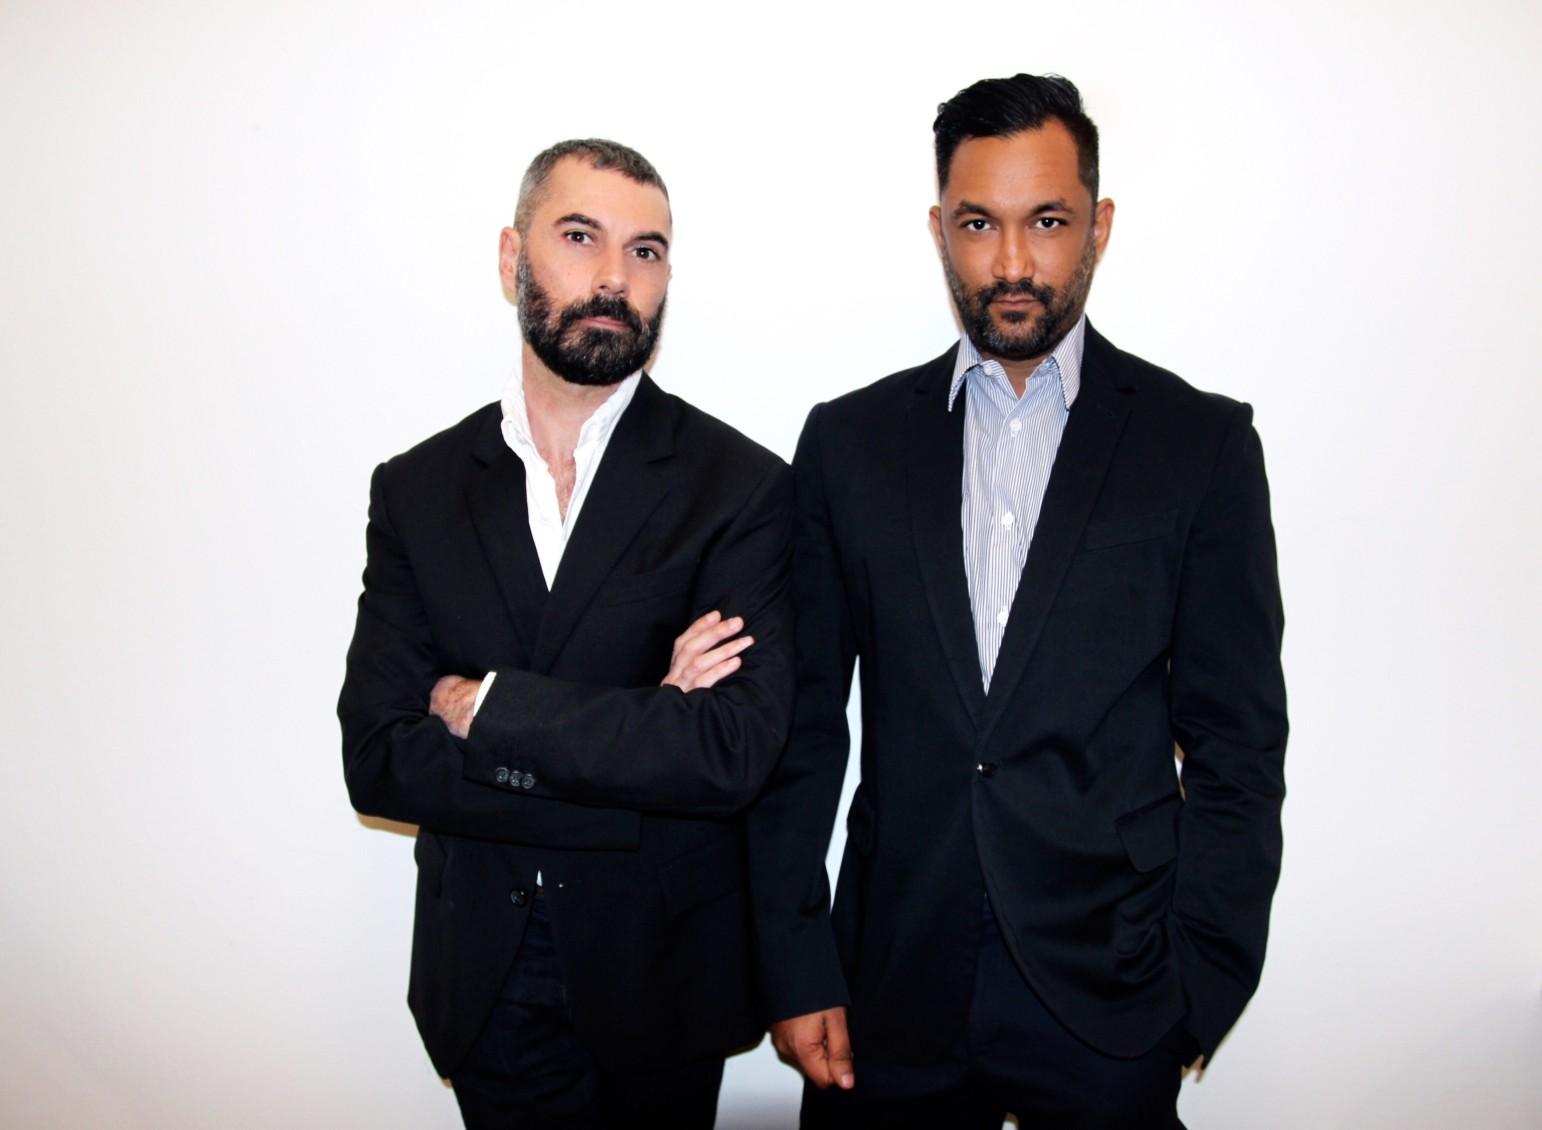 Ryan Lobo and Ramon Martin of Tome